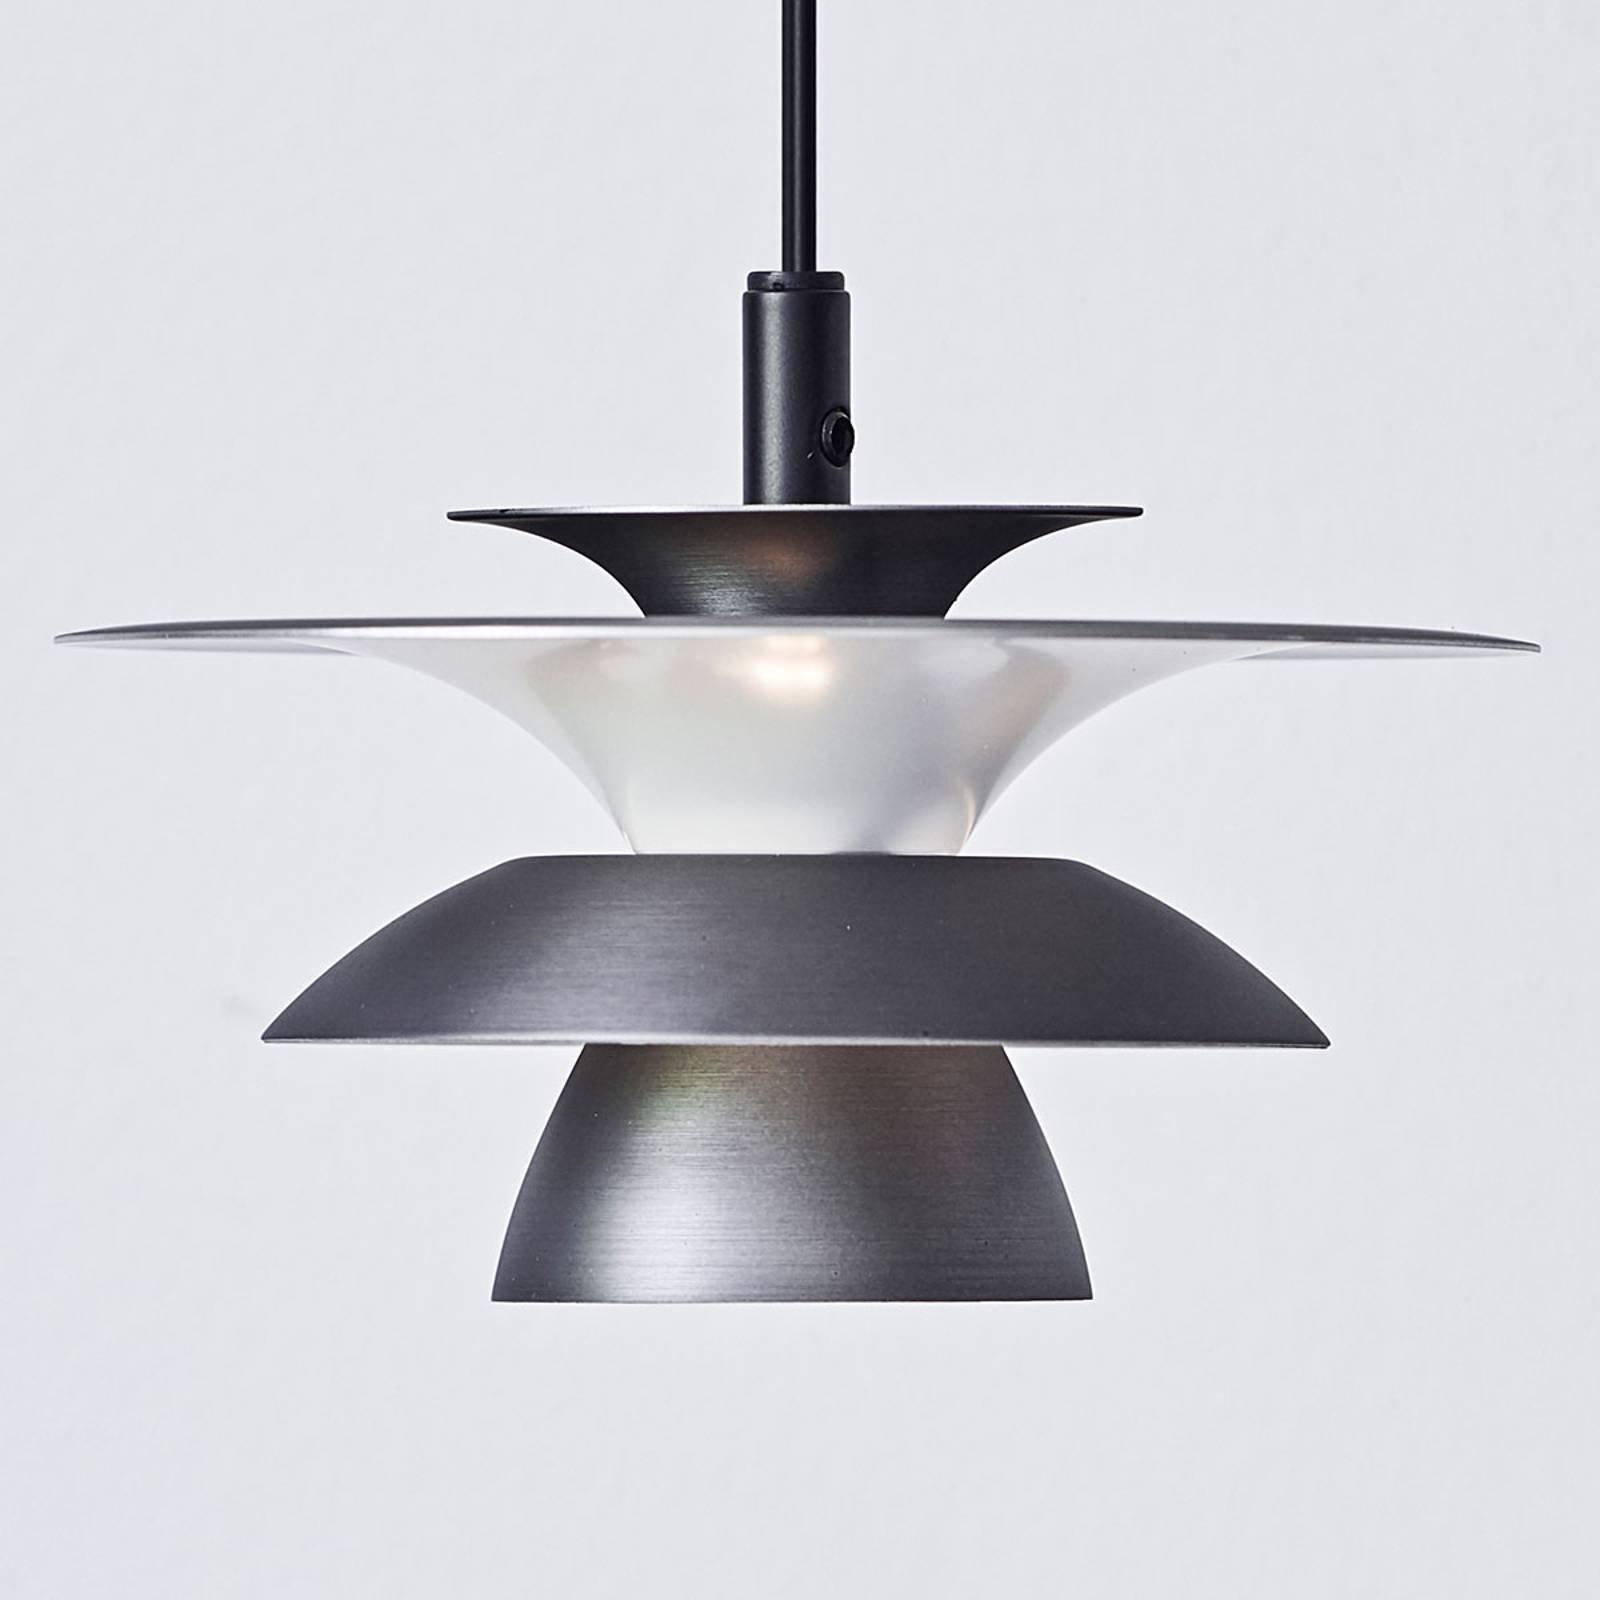 LED-pendellampe Picasso 1 lyskilde Ø 18cm oksidgrå